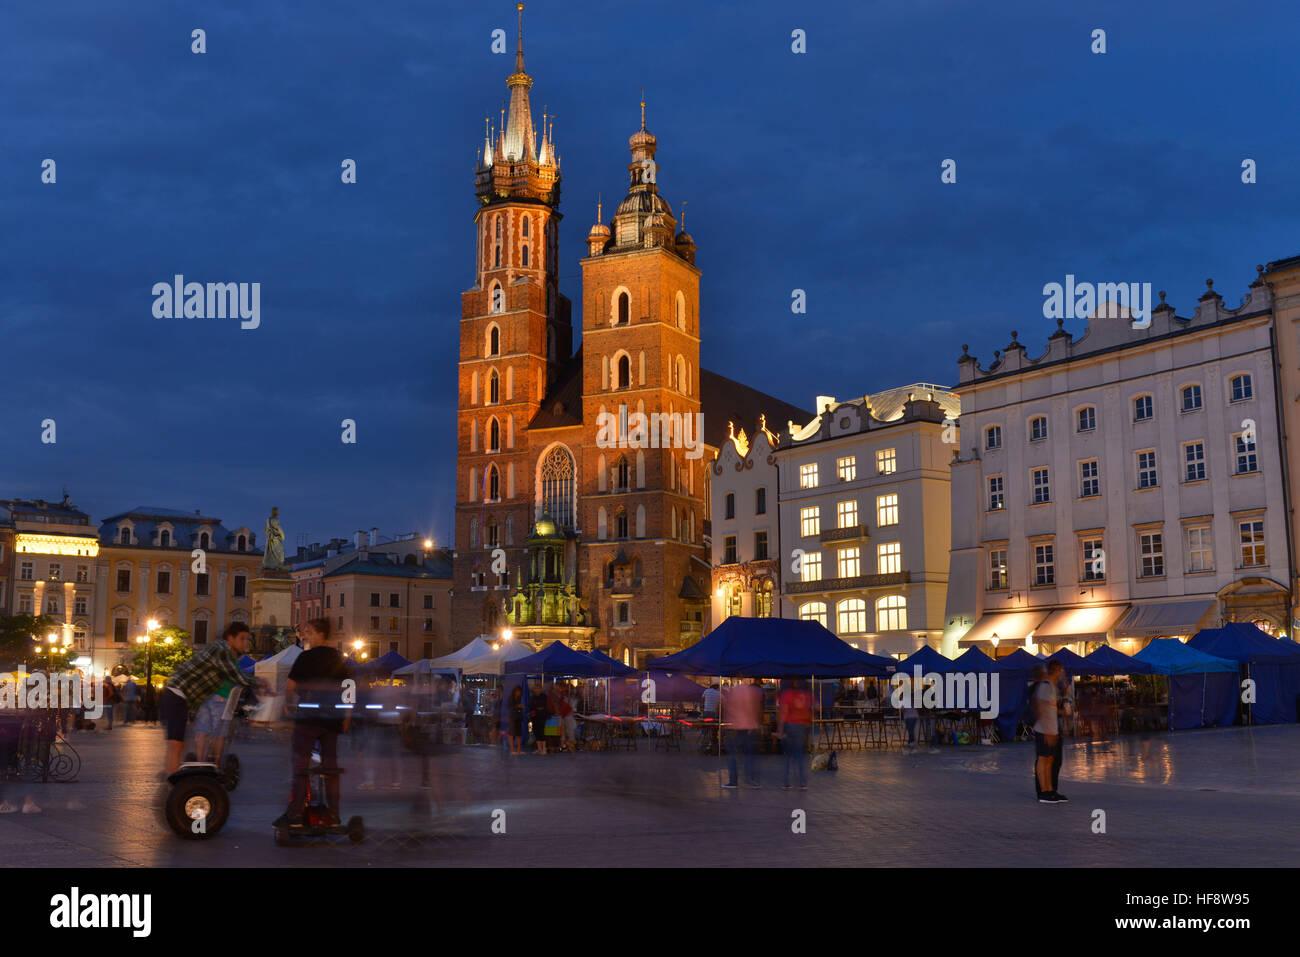 Marienkirche, Hauptmarkt, Krakau, Polen, Marien's church, central market, Cracow, Pole - Stock Image